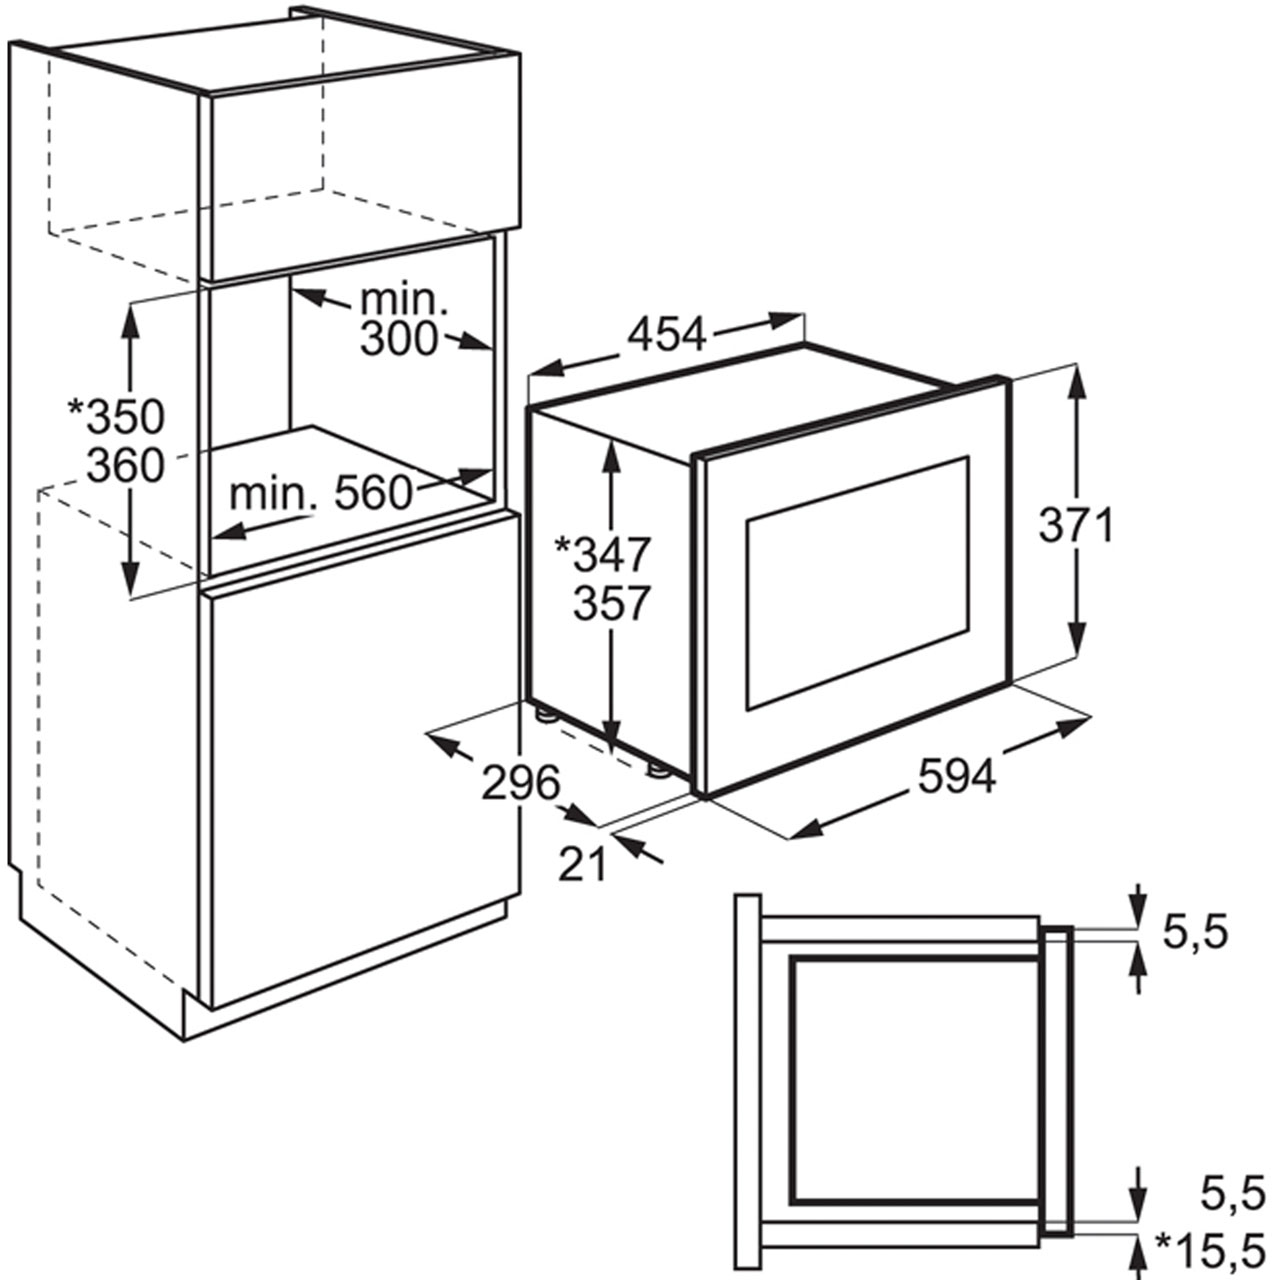 Microwave Standard Size – BestMicrowave